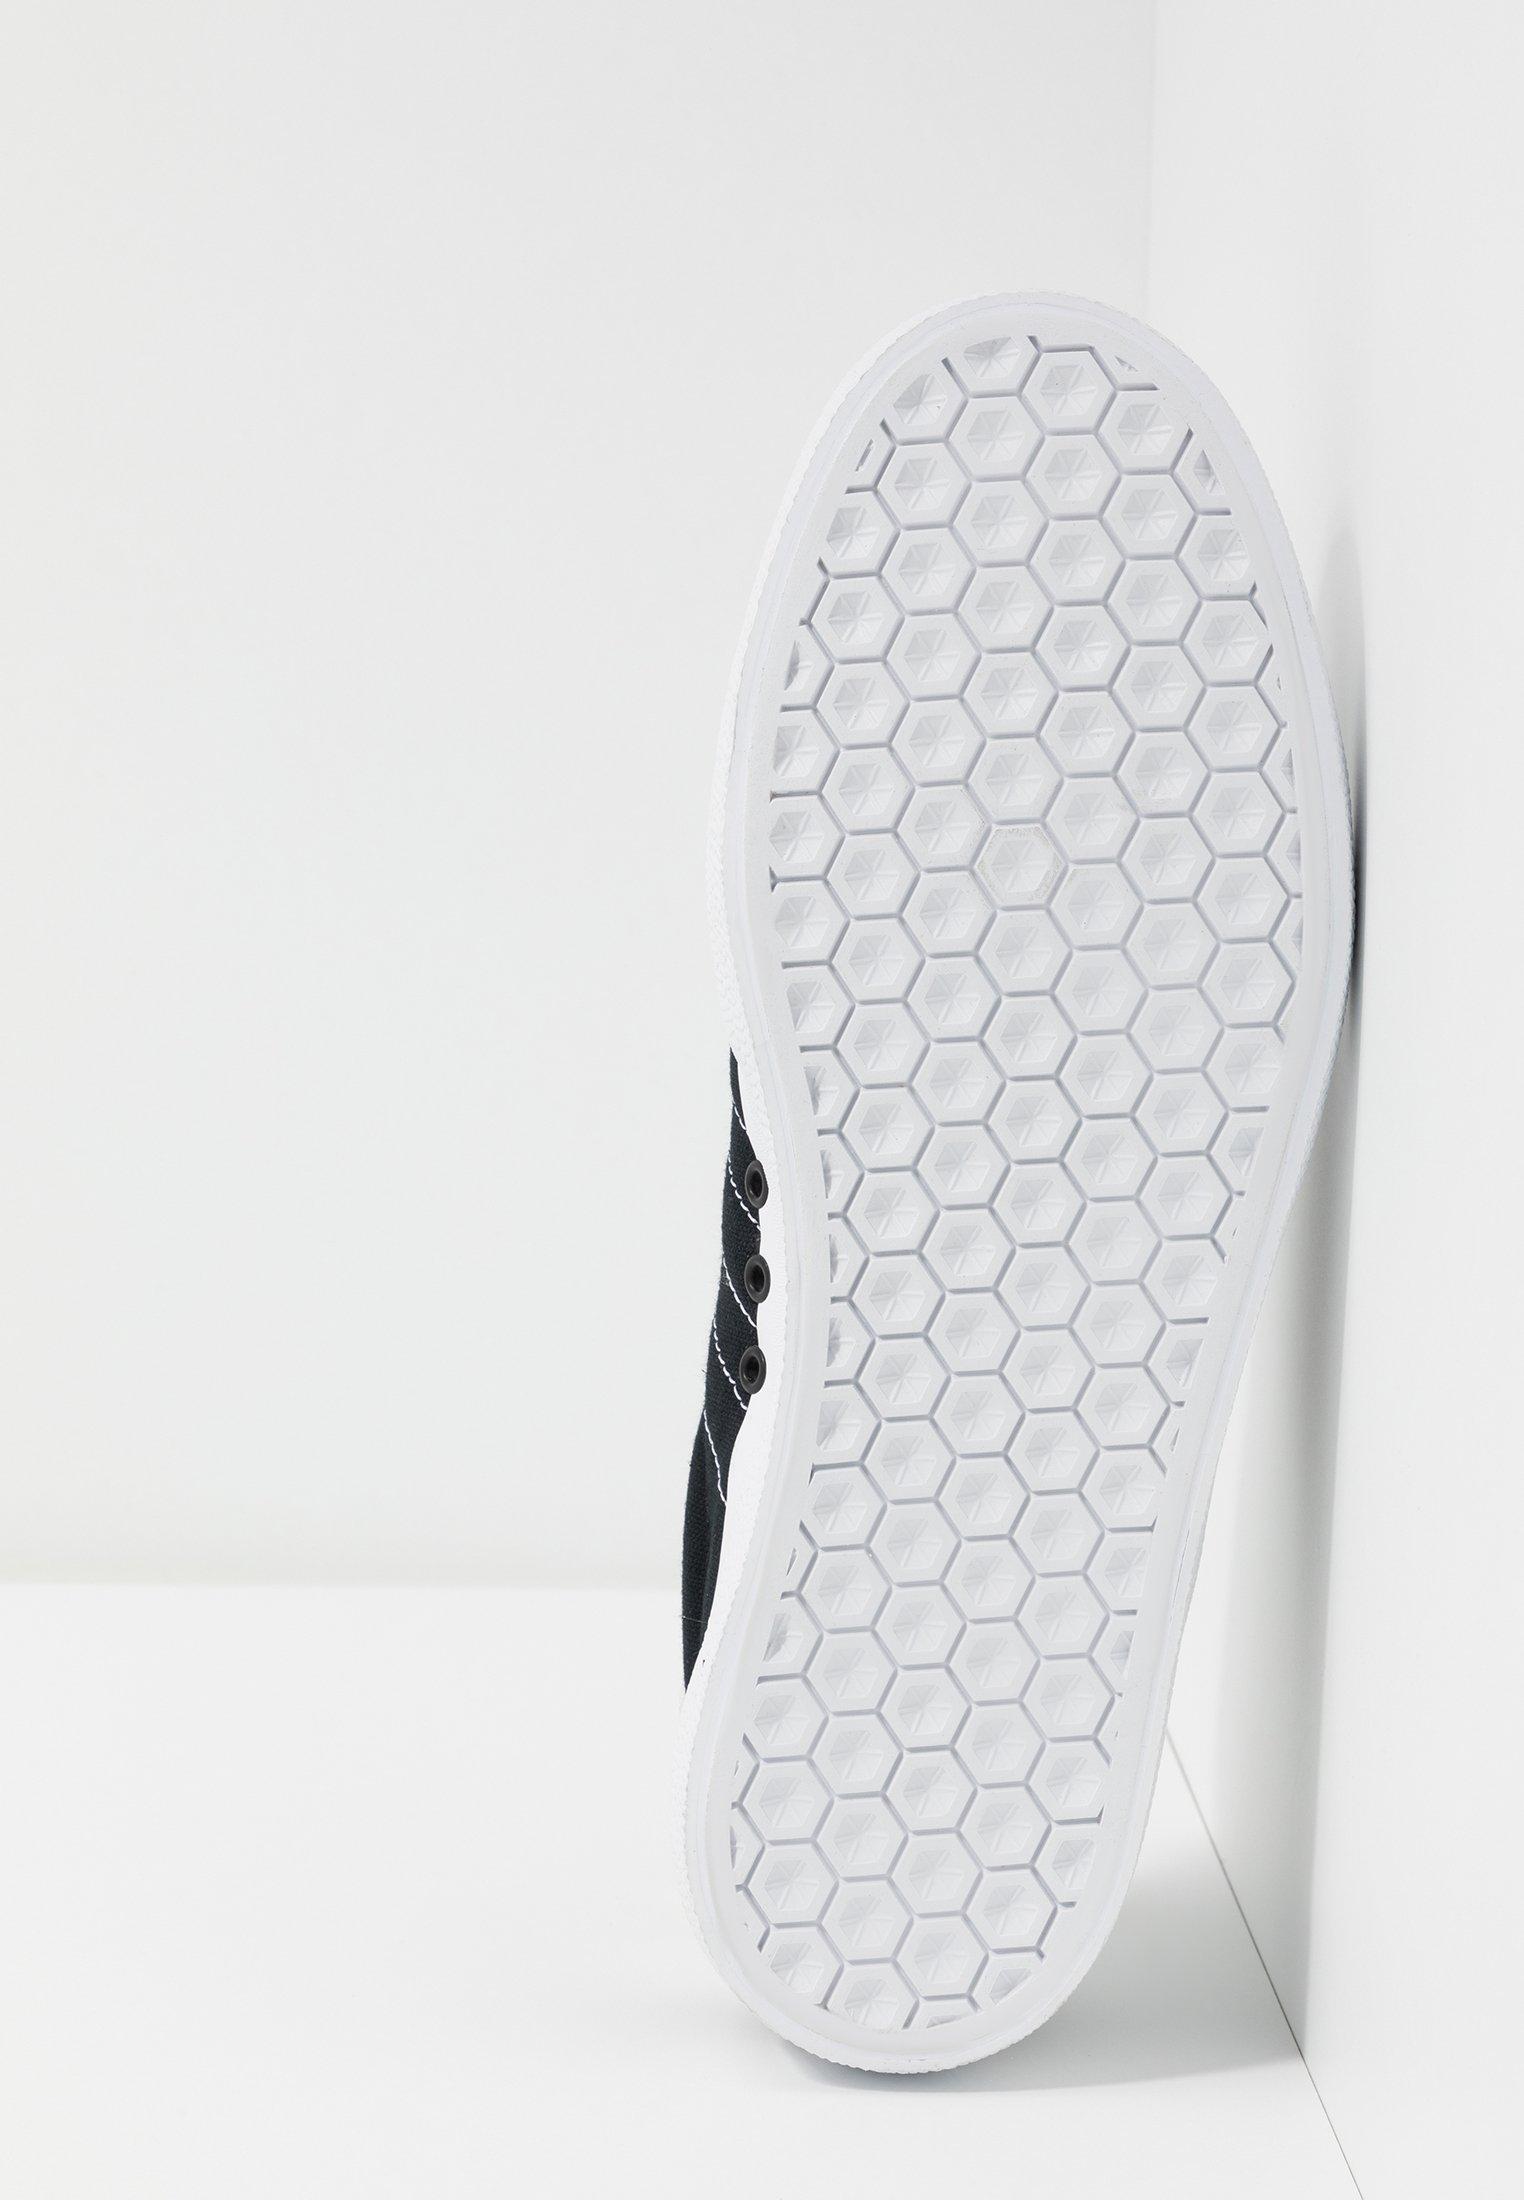 Core Adidas Originals Basses White footwear Black 3mcBaskets PXnkwON80Z